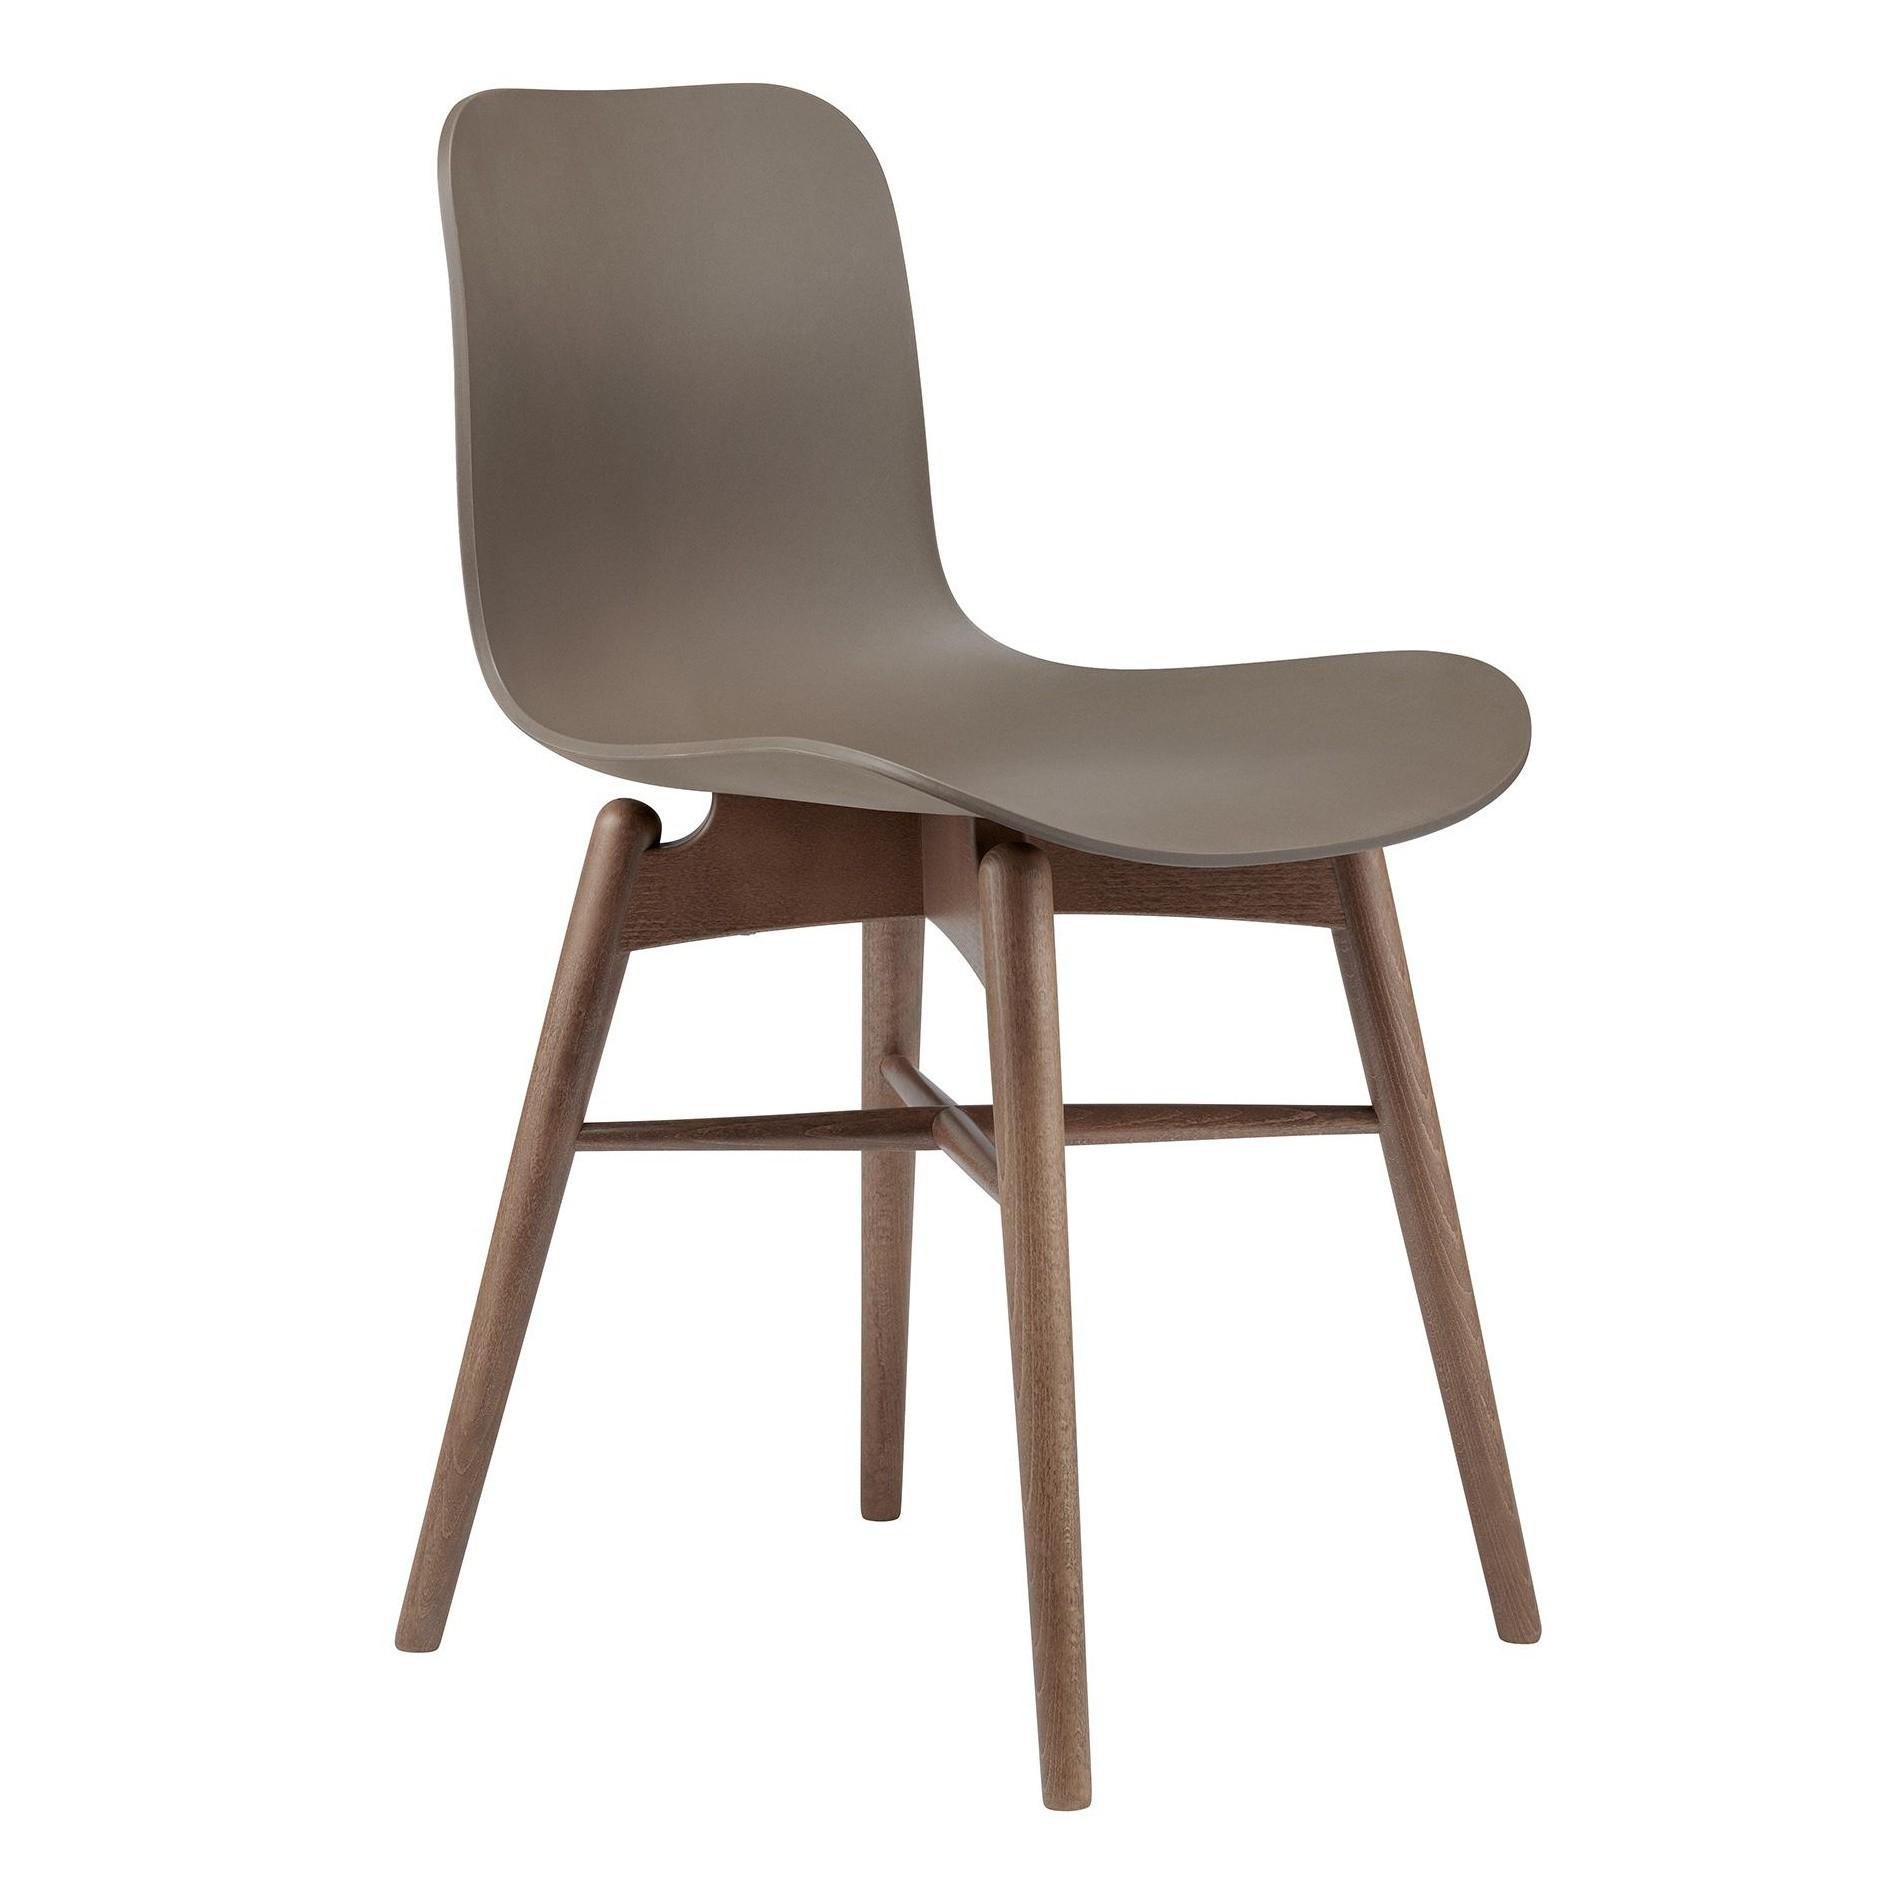 Langue Original Chair Smoked Beech Base